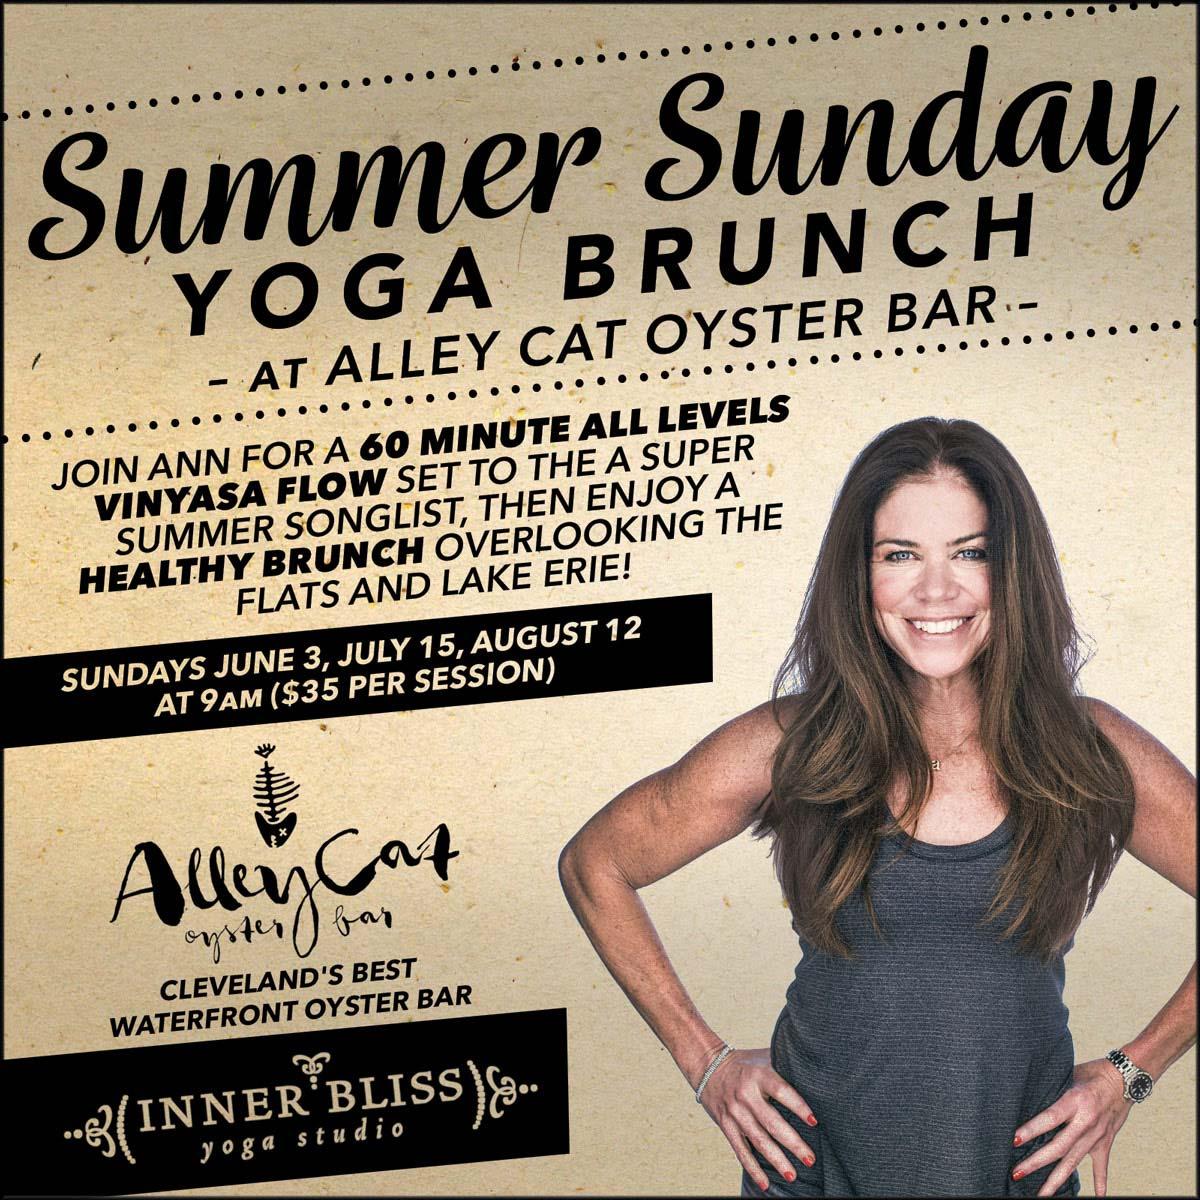 Summer Sunday Yoga Brunch at Alley Cat Oyster Bar